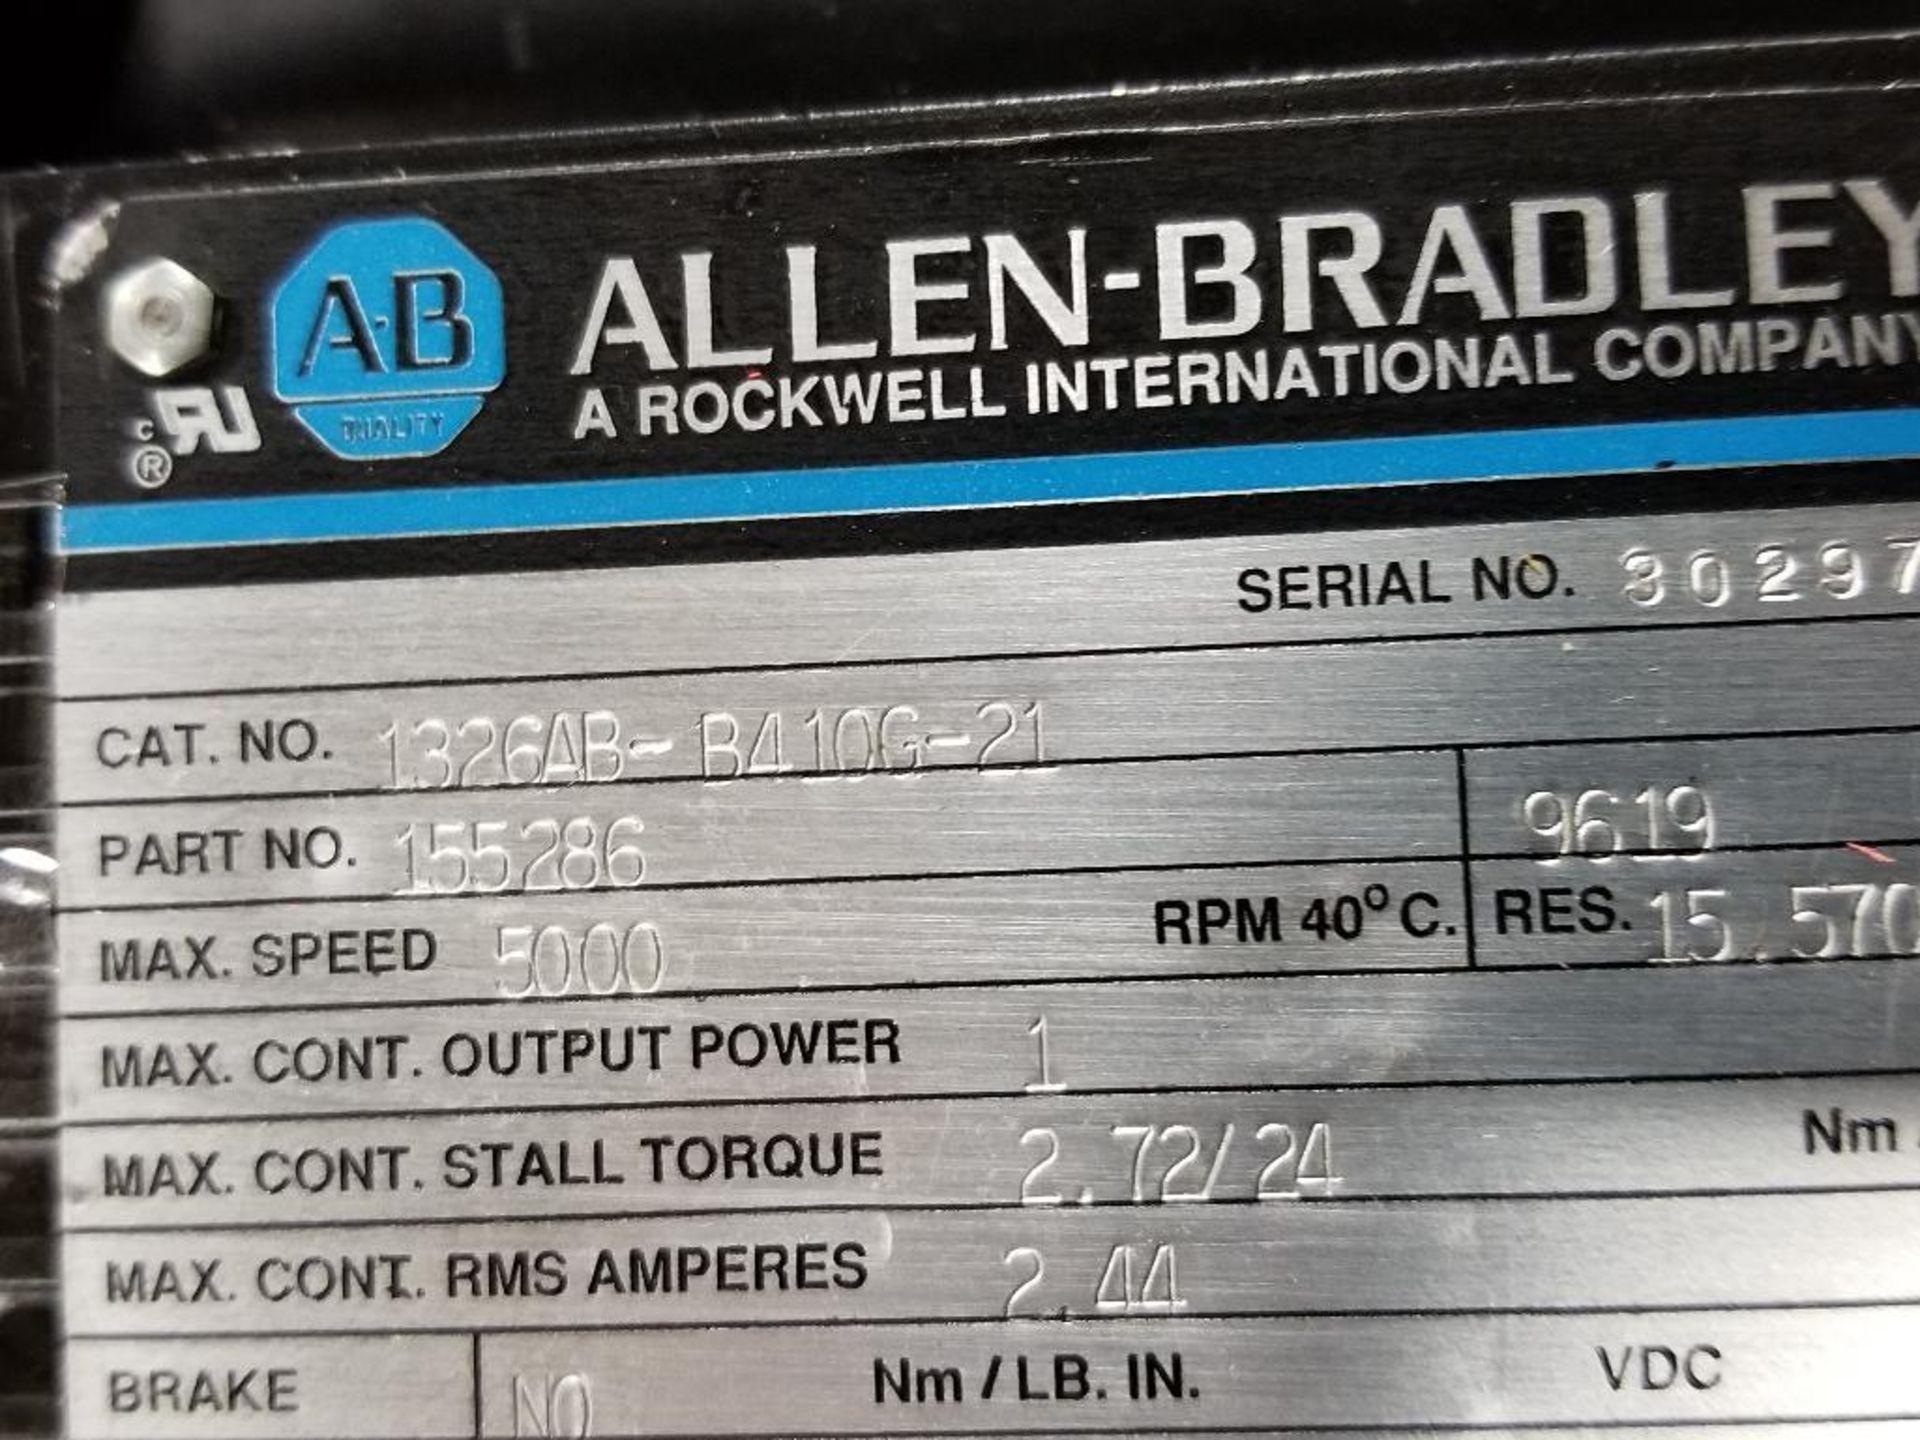 1kW Allen Bradley servo motor. Cat# 1326AB-B410G-21, Part# 155286, 5000RPM. - Image 3 of 6